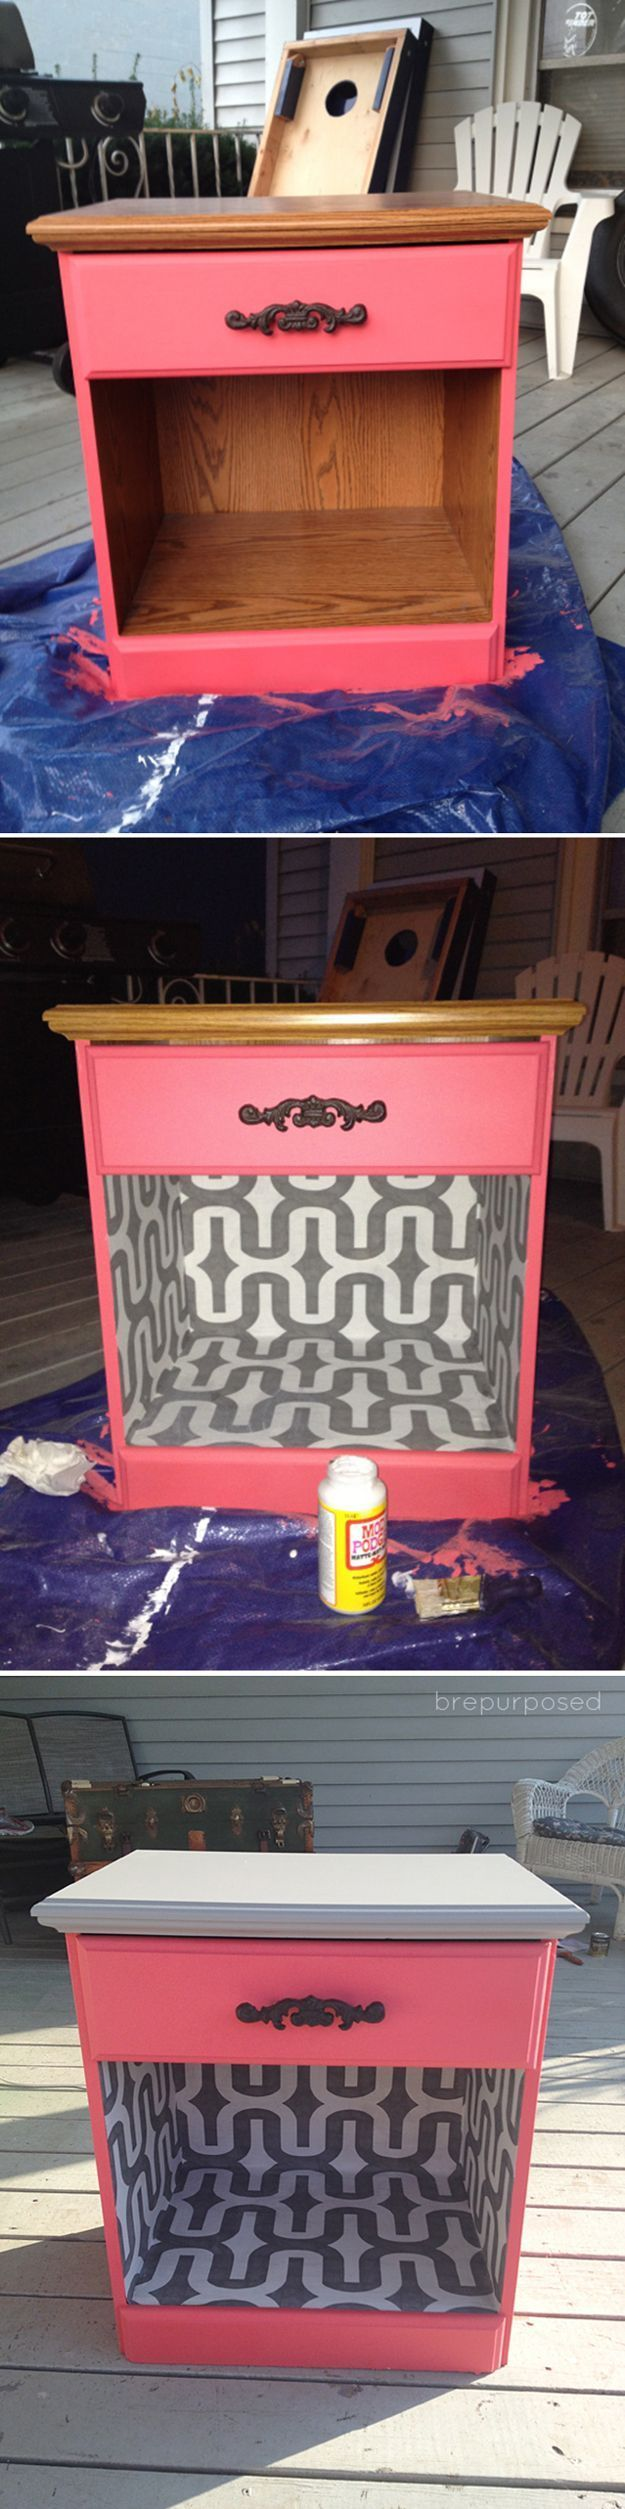 Best Simple Creative Homemade Diy Nightstand Ideas 8 Night 400 x 300